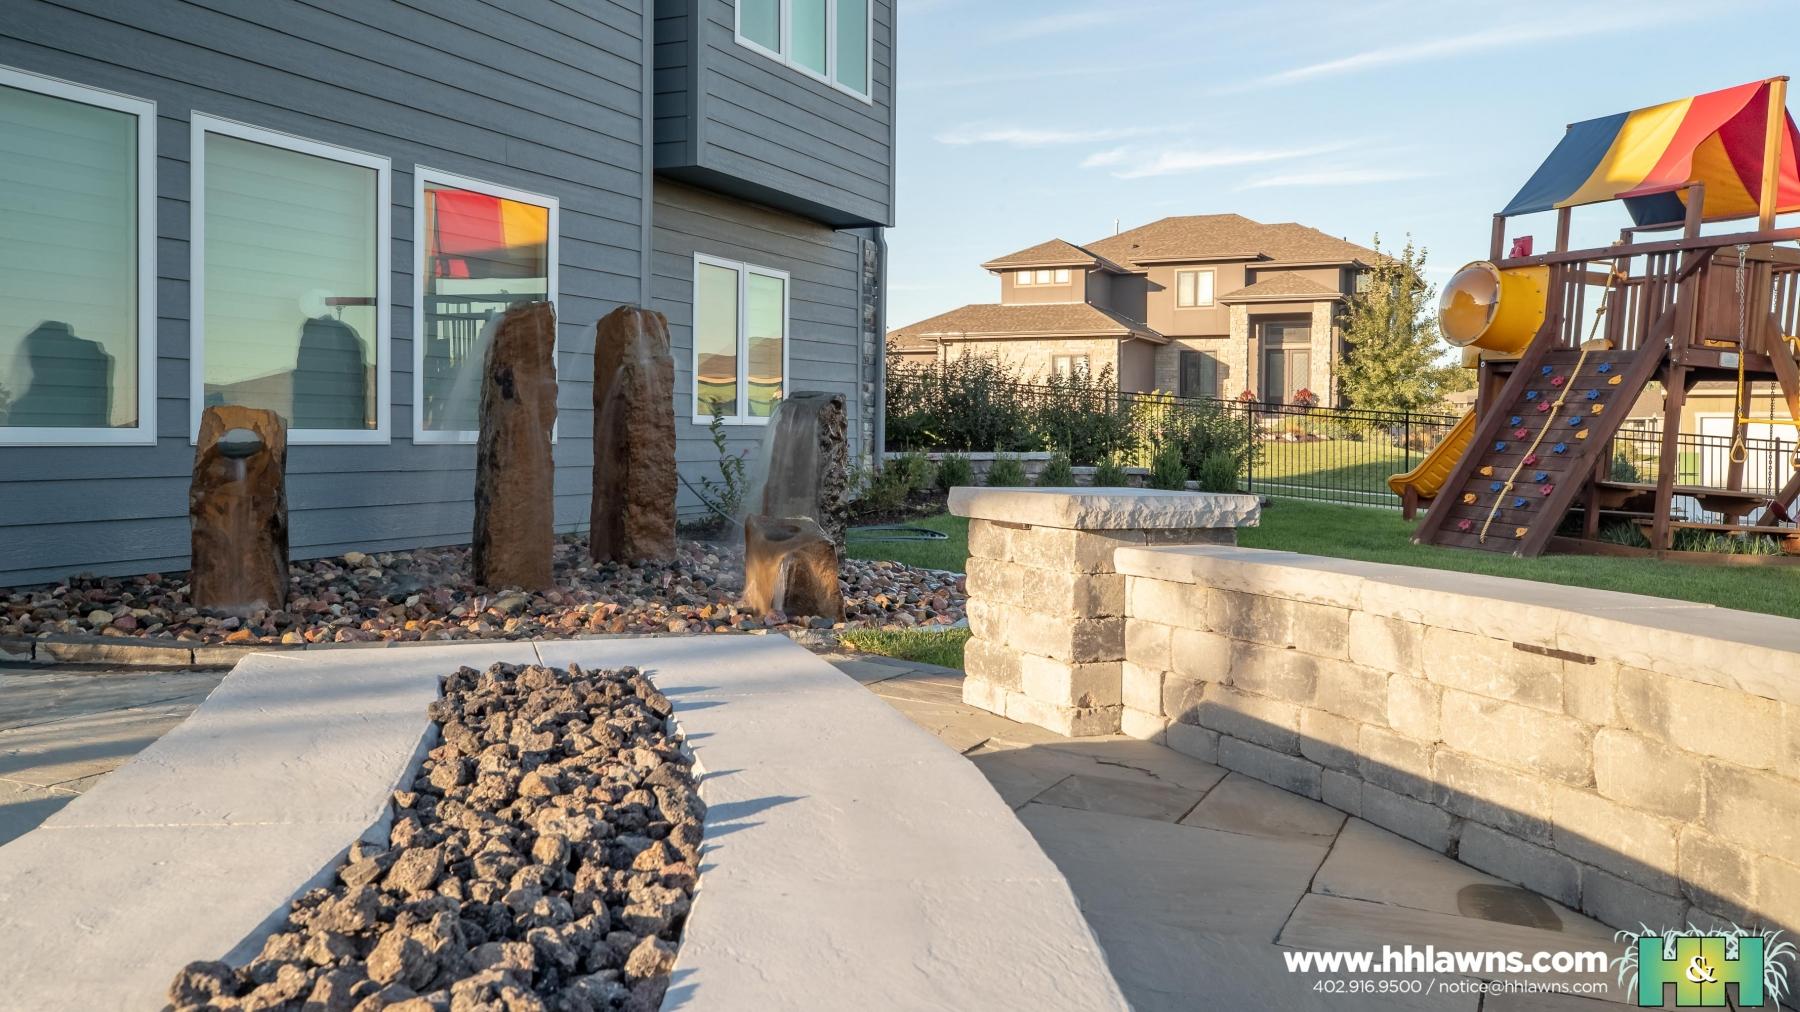 092419 Coughlin Omaha Landscape Company H&H Lawn and Landscape Omaha, Nebraska Created By // Nathan Olsen